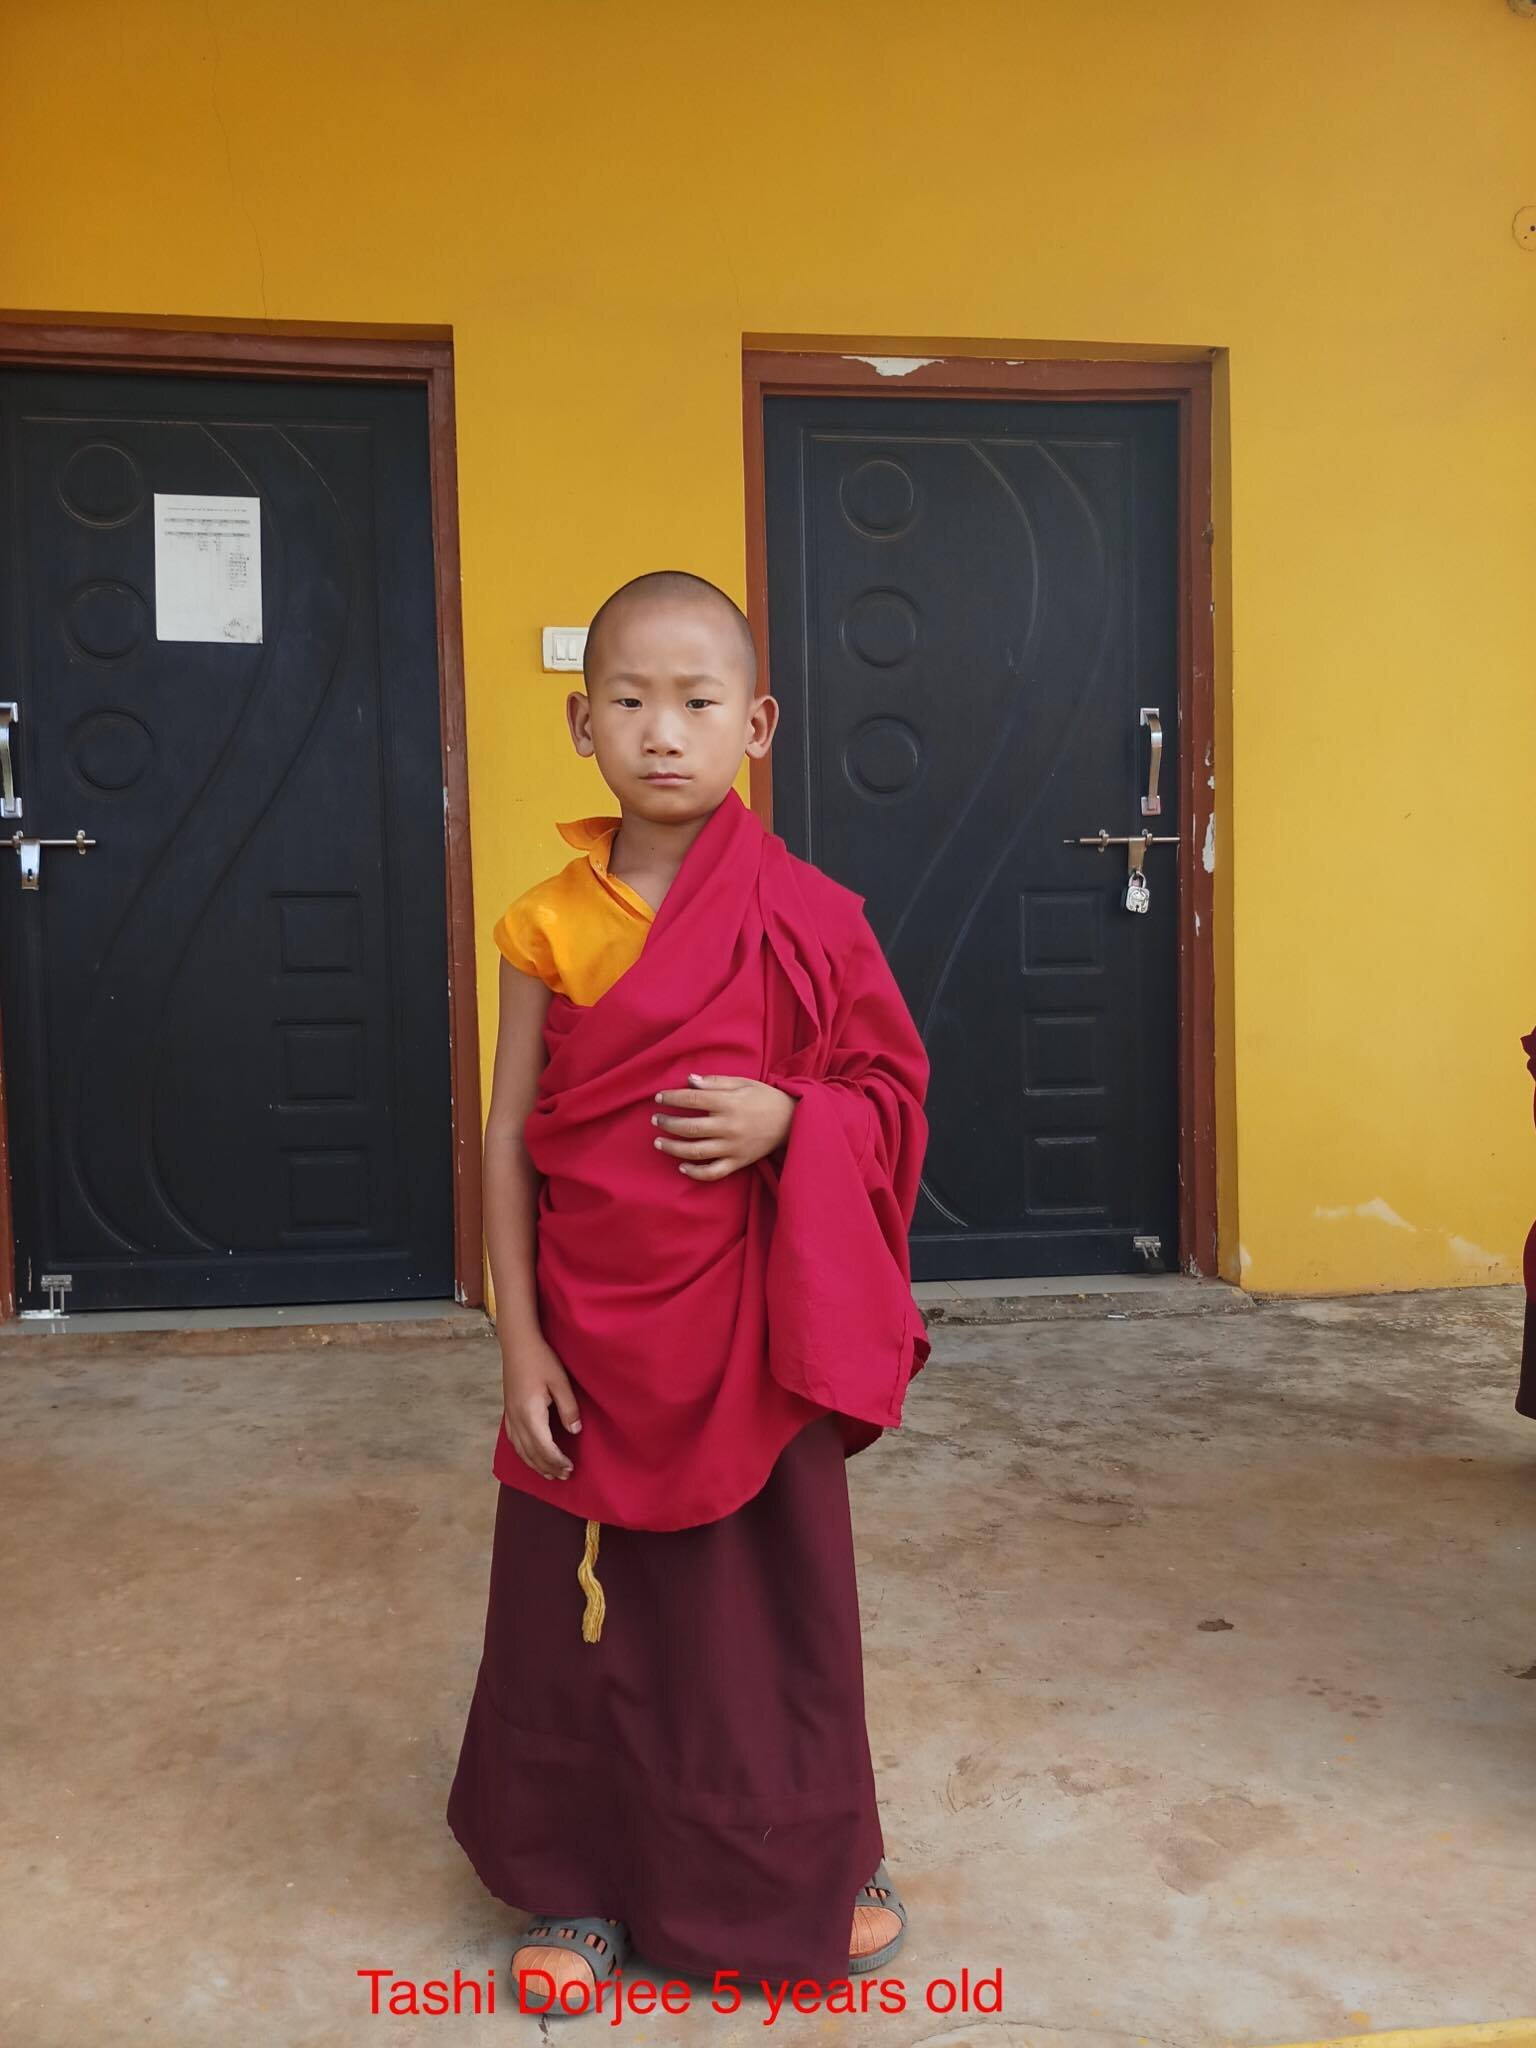 Monk_Tashi_Dorjee_5yrs_old.jpg